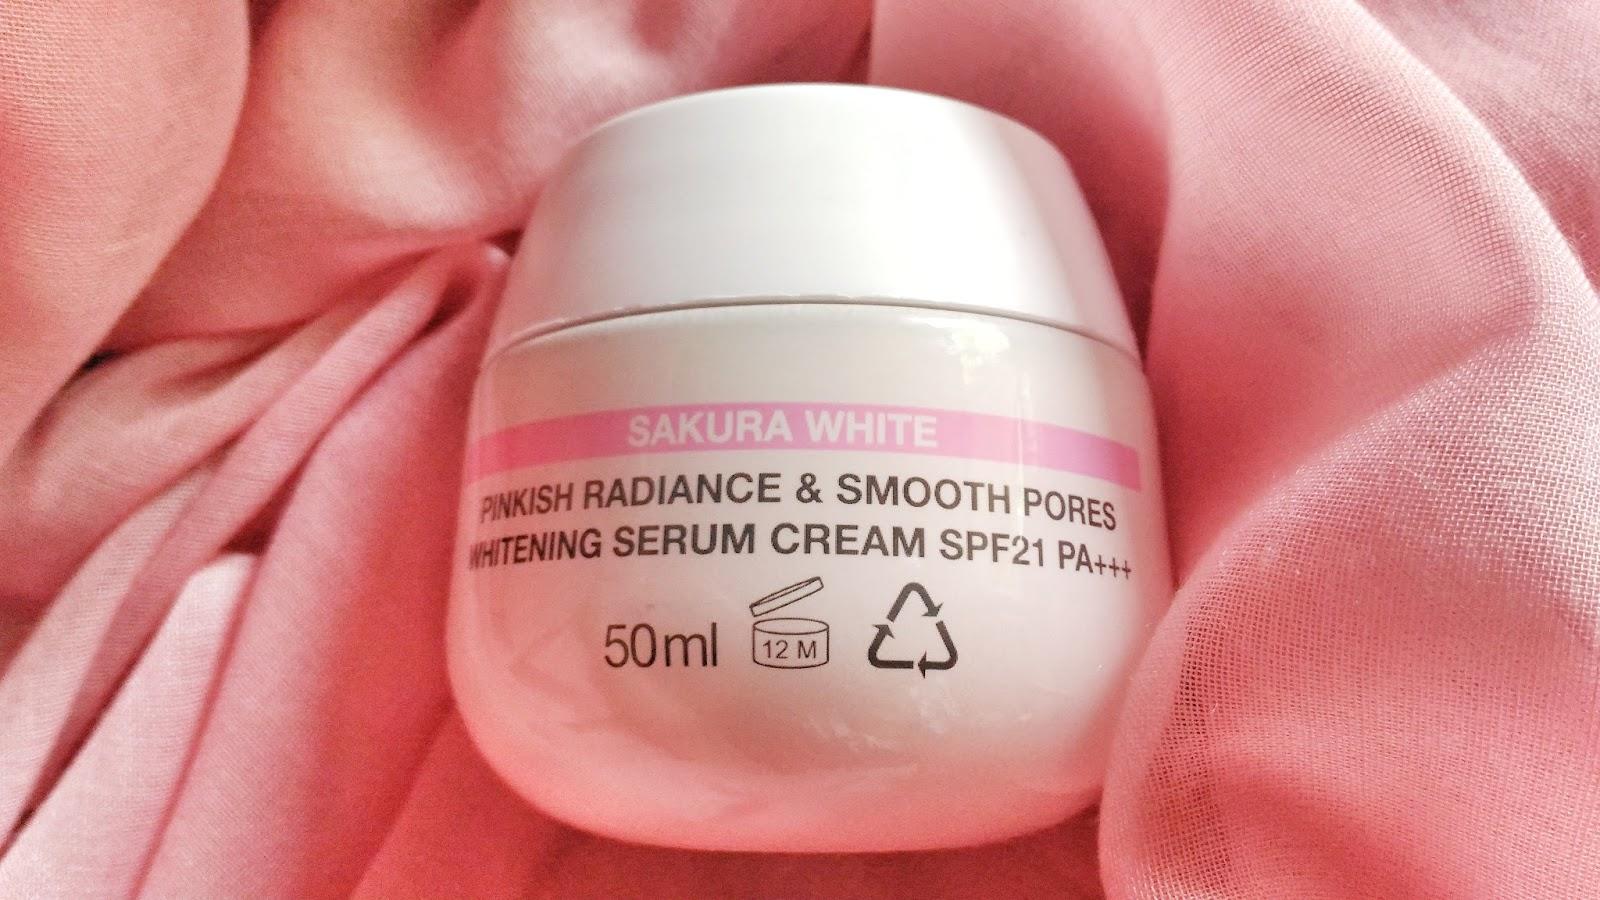 Review Garnier Sakura White Pinkish Radiance Smooth Pores 18ml Spf21 Haha Entahlah Tapi Kayaknya Aku Yakin Deh Ini Udah Halal Kok Mana Mungkin Mereka Berani Membohongi Publik Benar Bukan